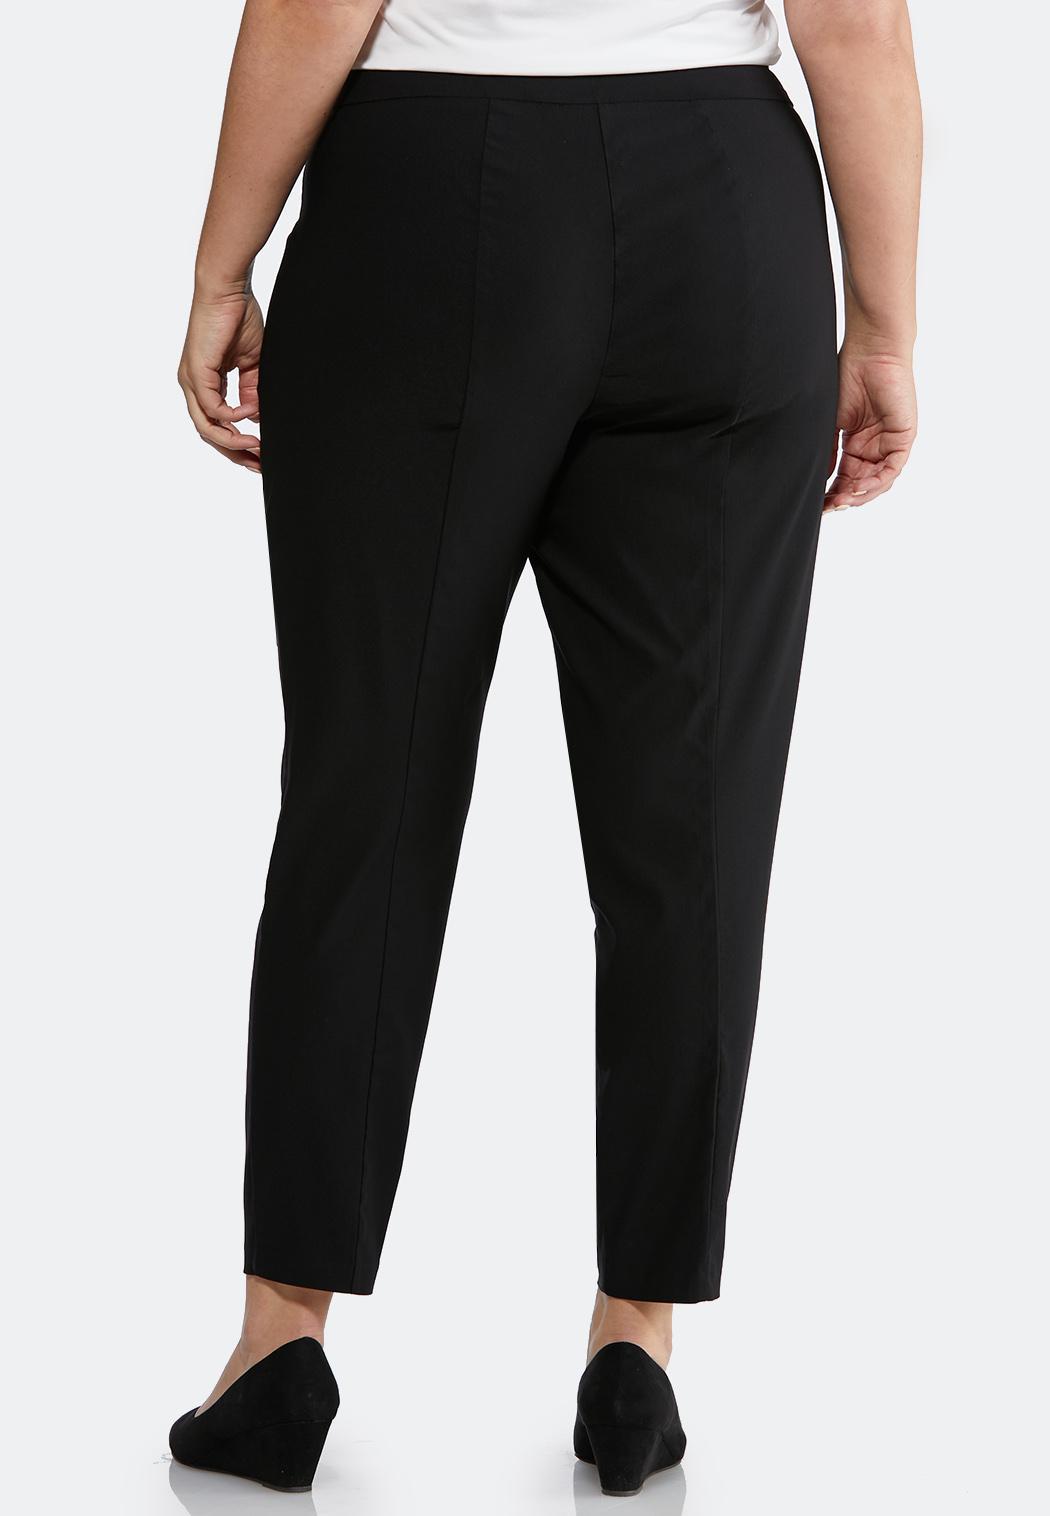 Plus Size Pull-On Solid Slim Pants (Item #43799439)